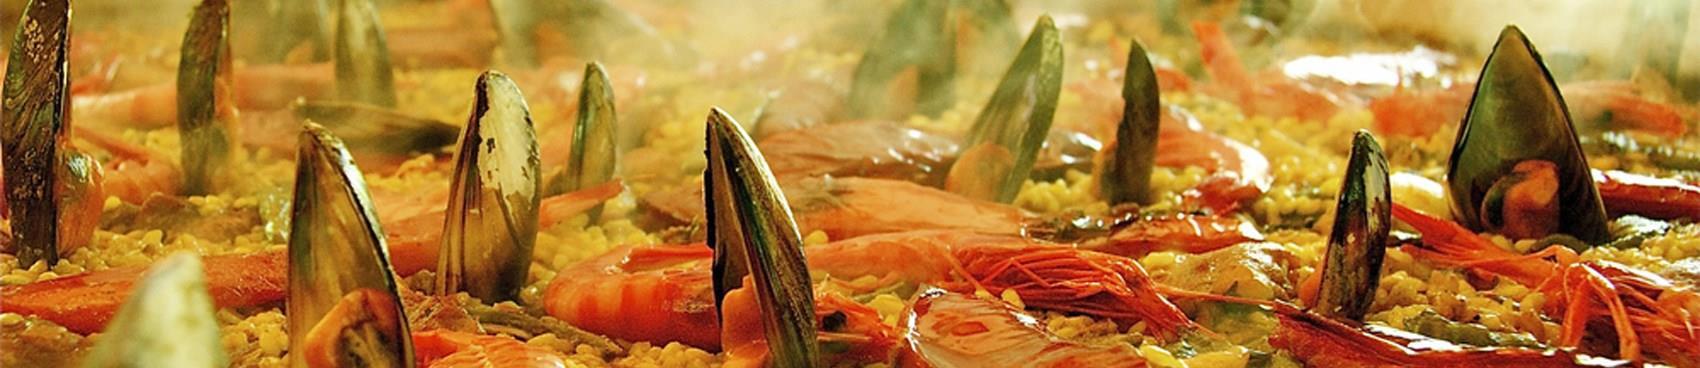 Benovia Chef's Series with Yay! Paella